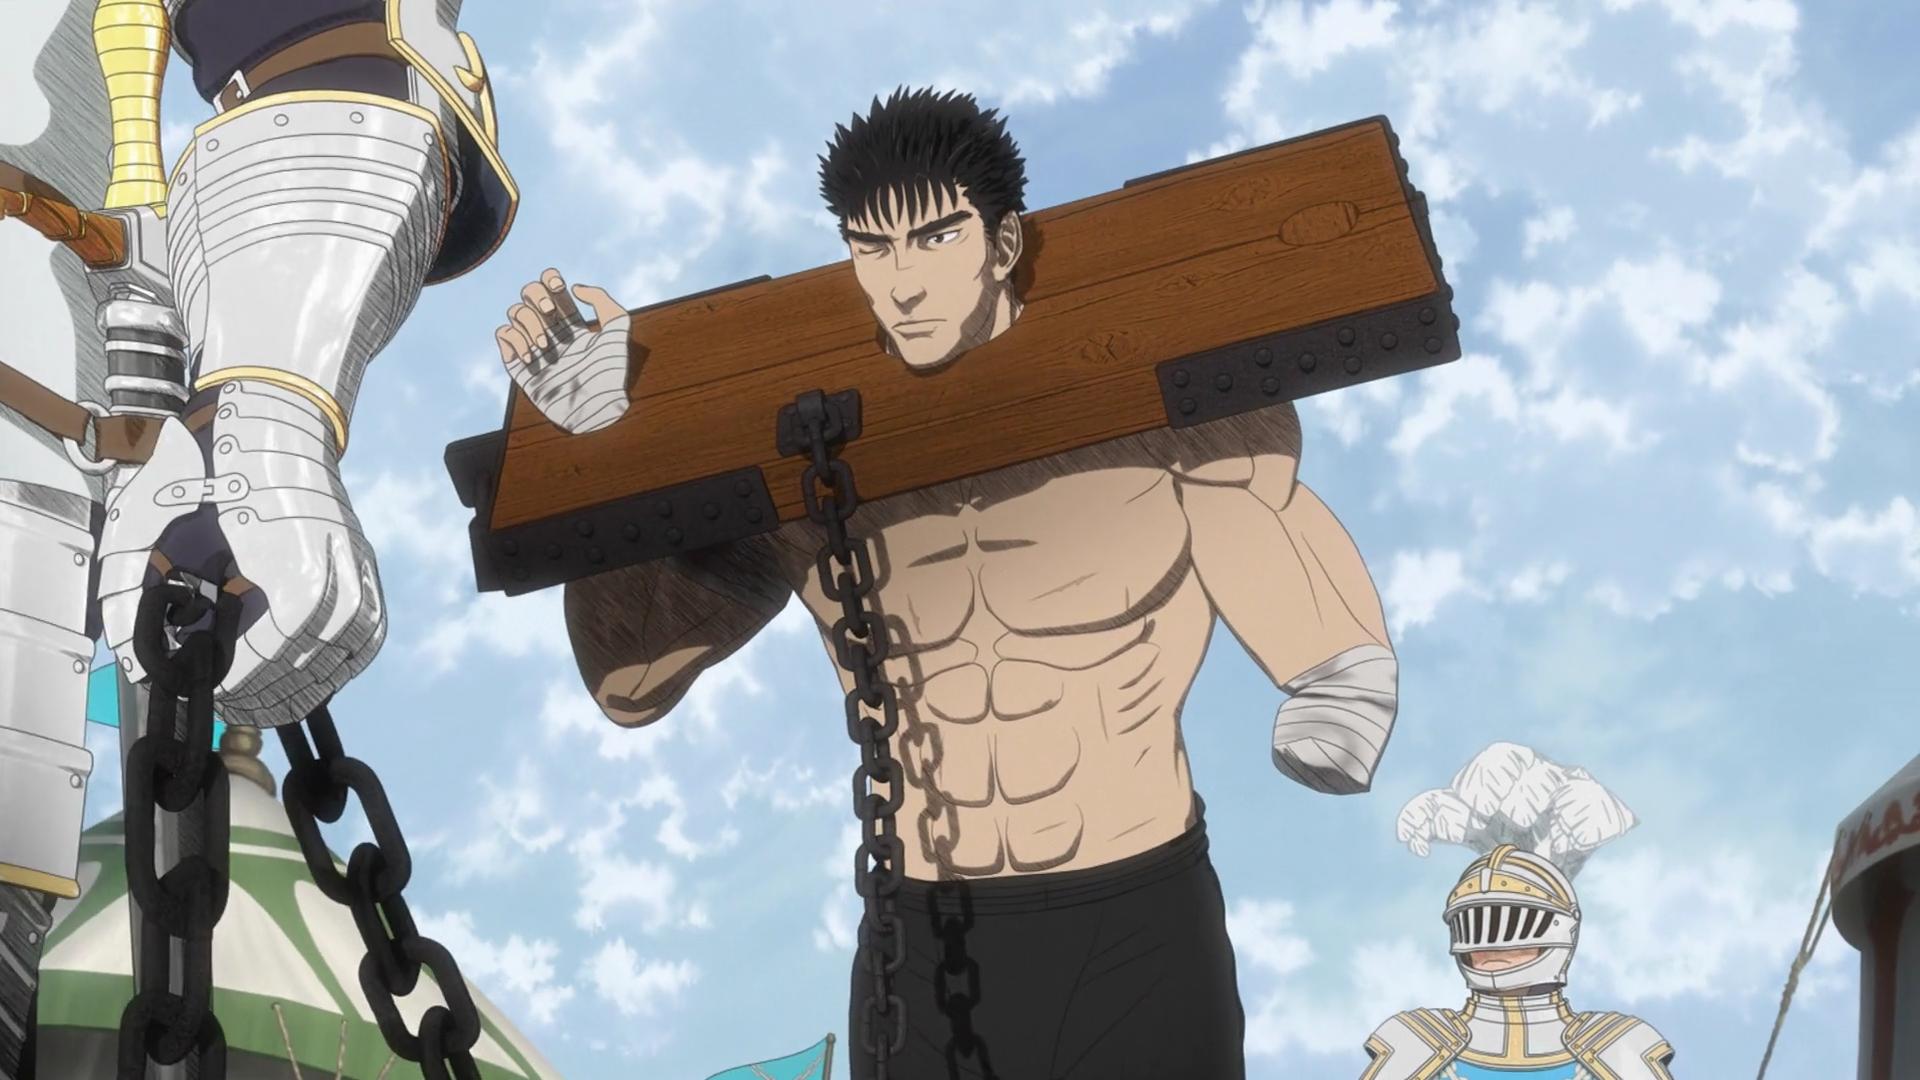 Berserk(the Anime Manga) images Berserk HD wallpaper and background photos 19f83295b